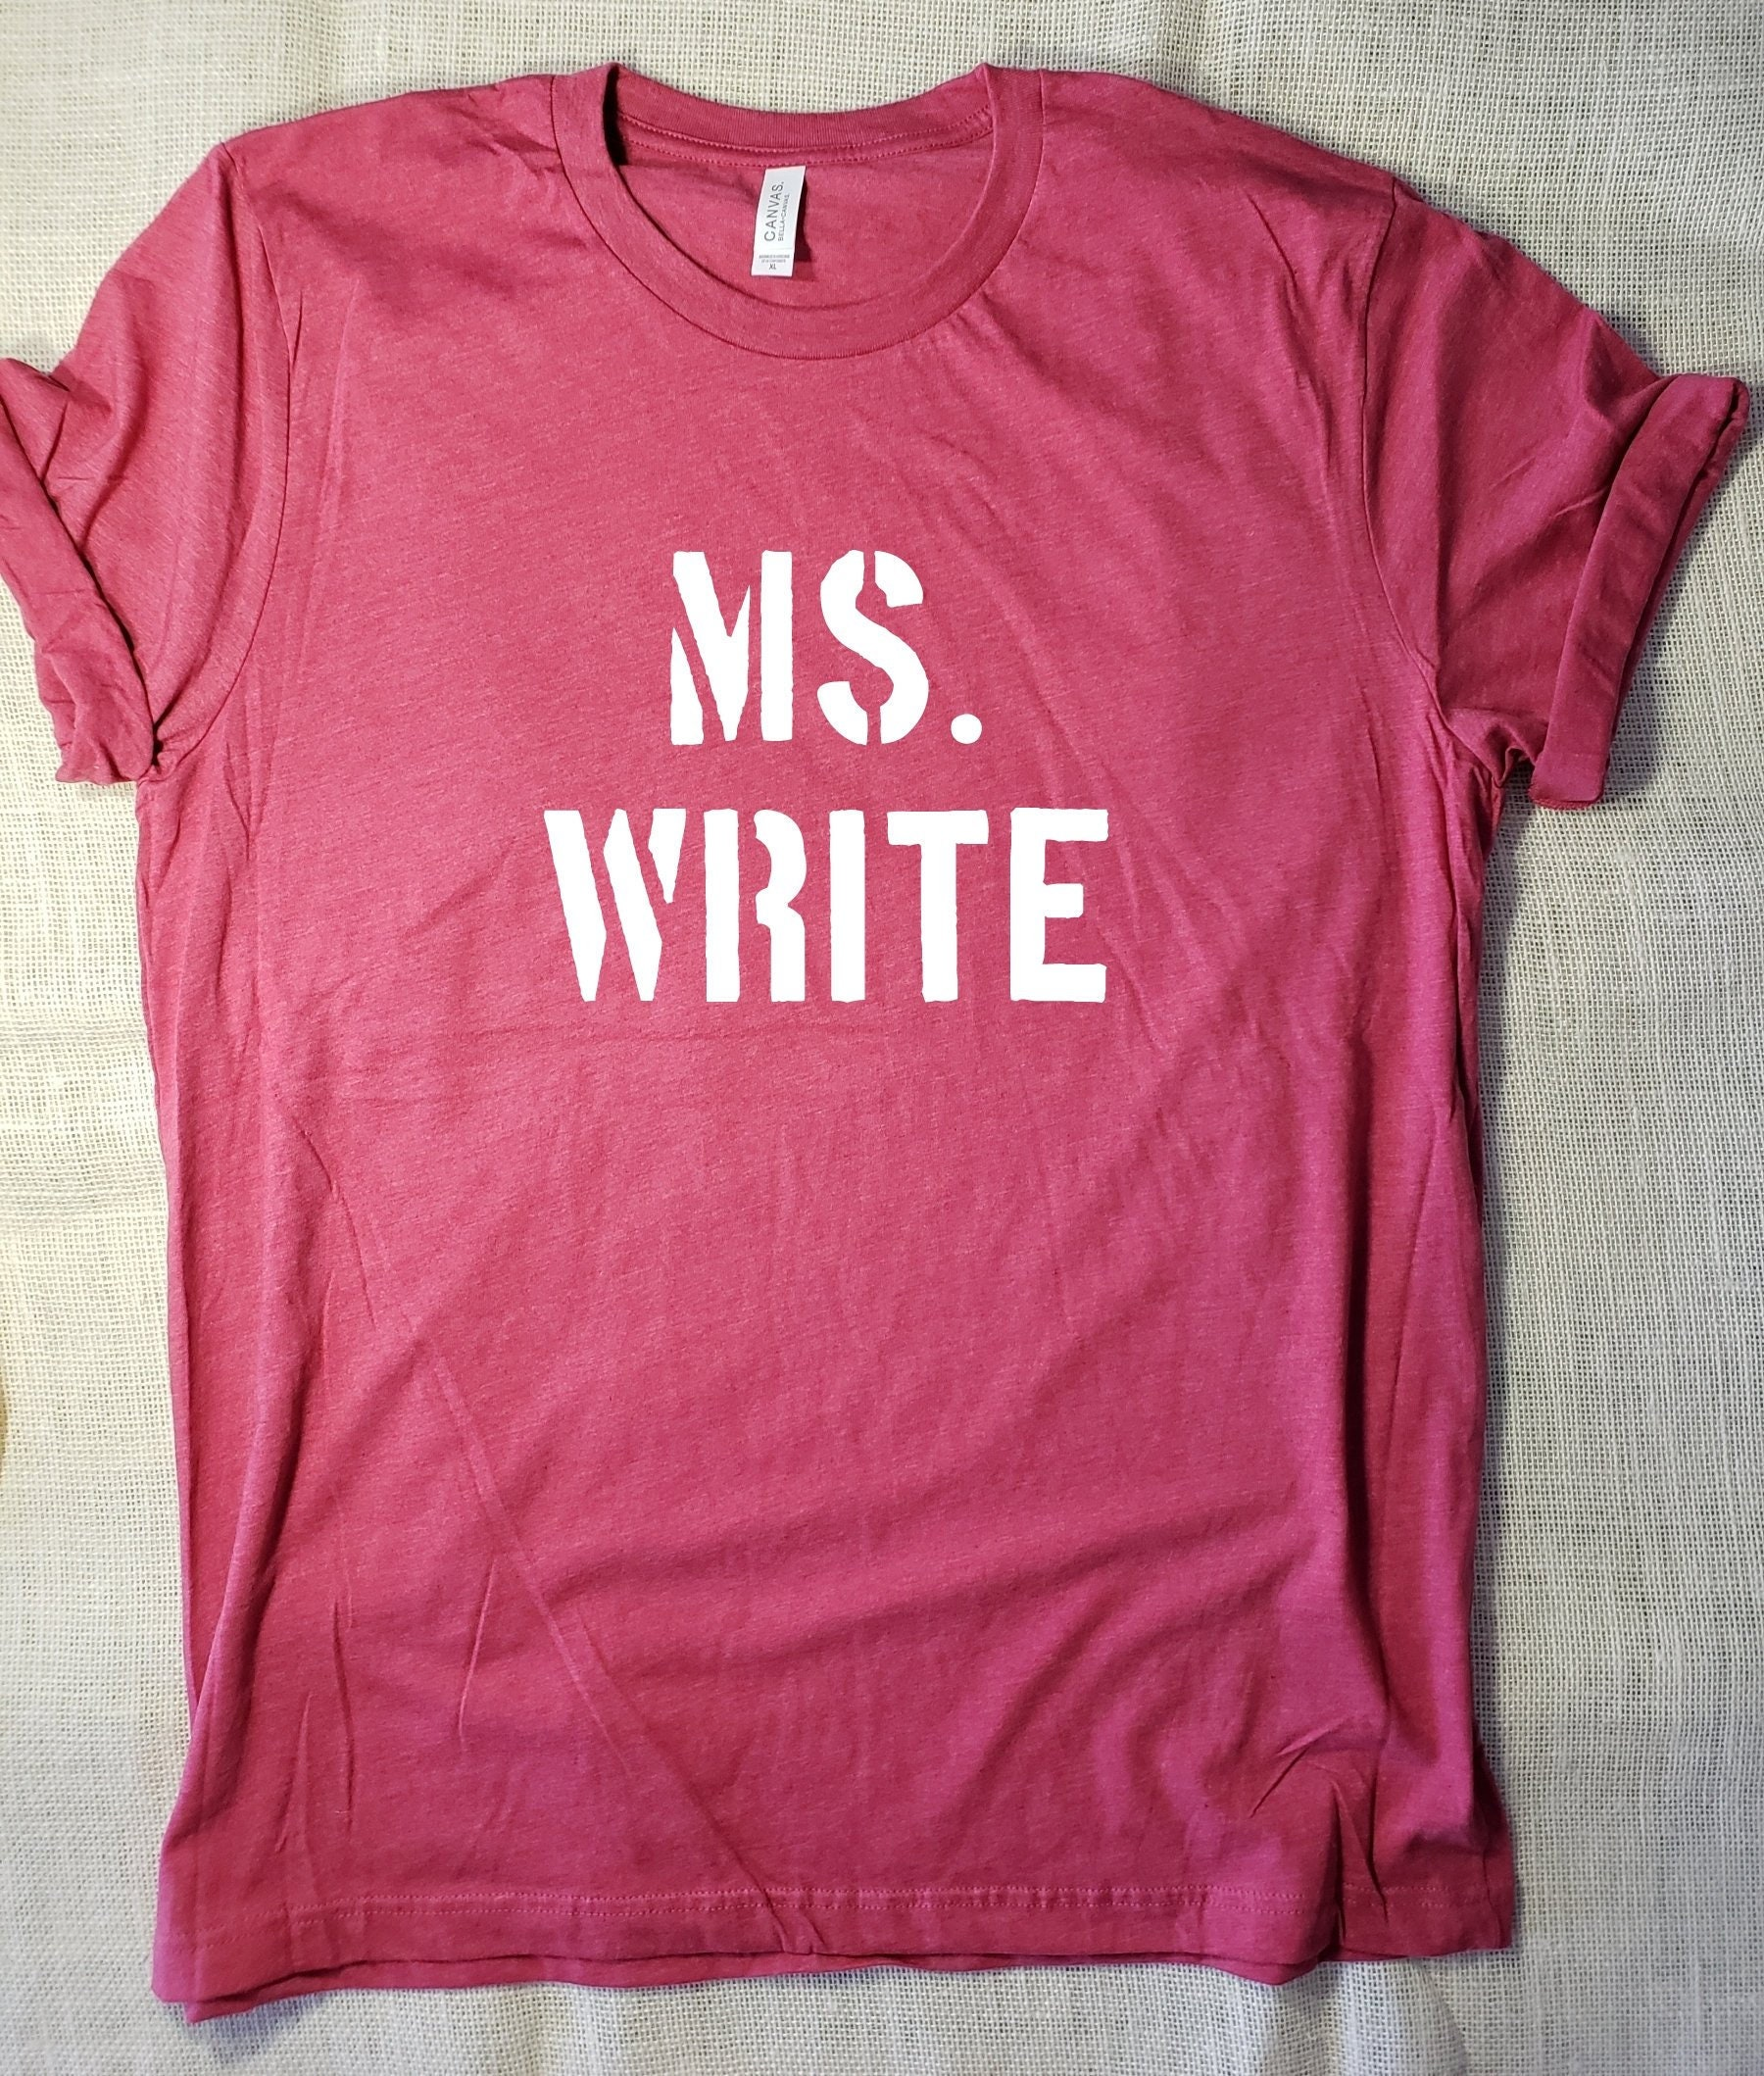 Ms Write T Shirt Writer Tee S M L Xl Style Shirt Design Etsy